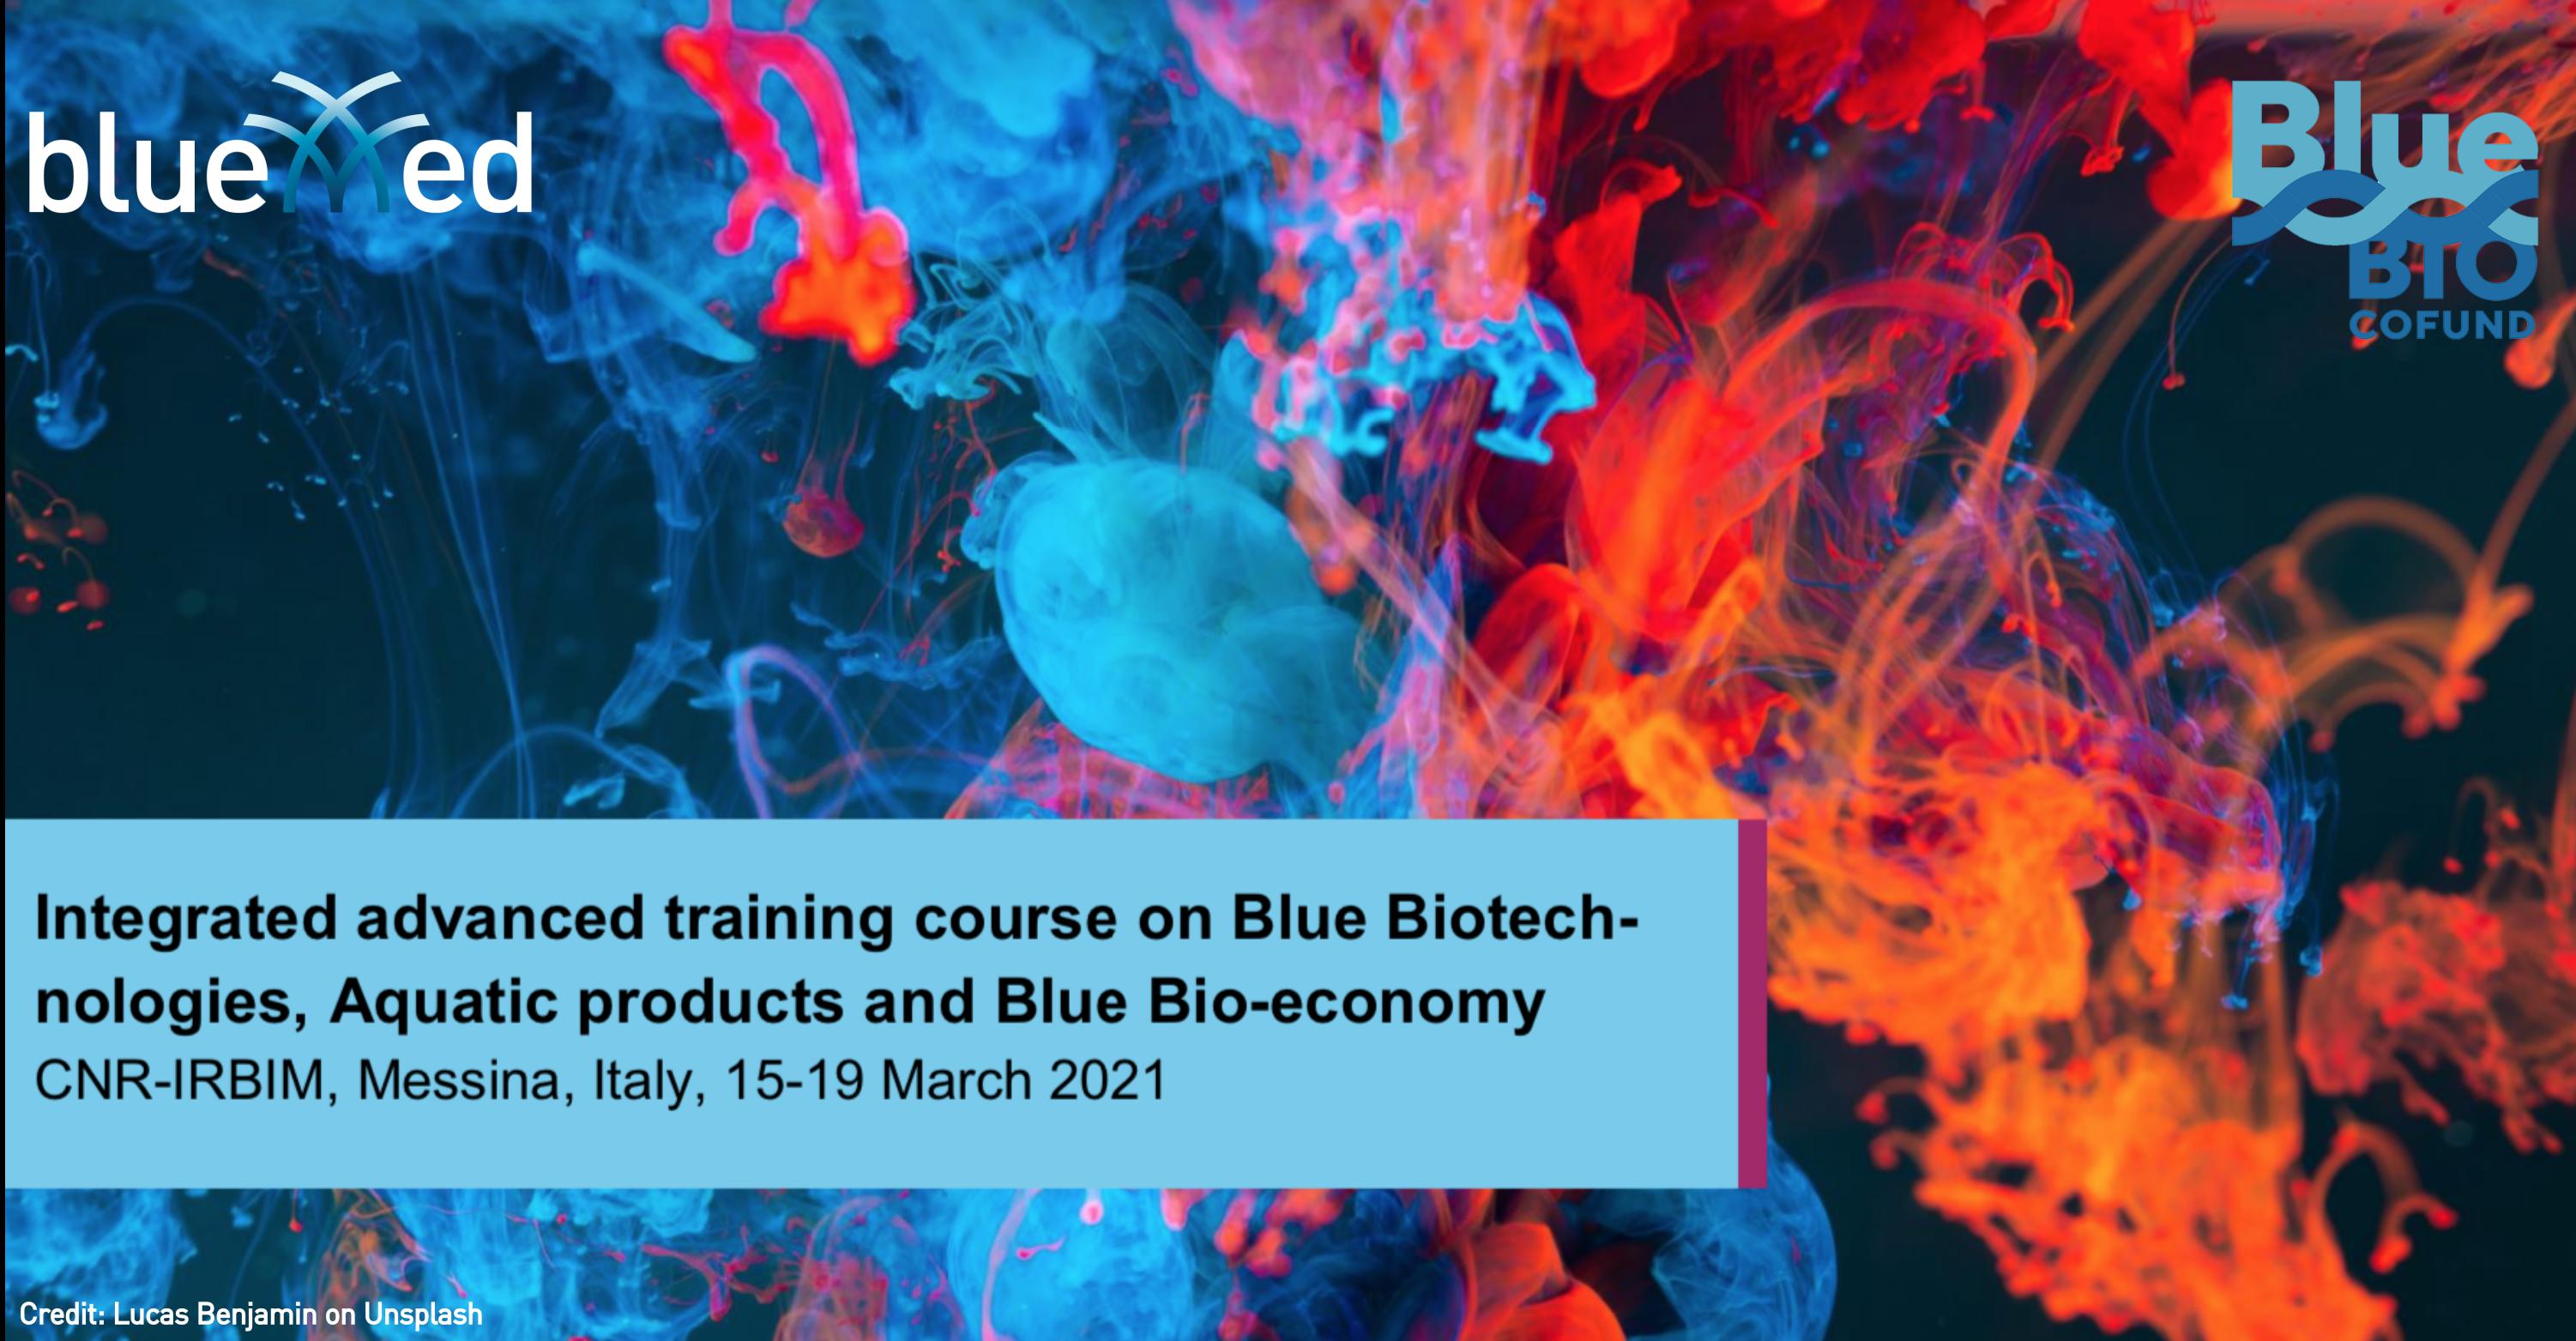 bluebiotech_960x500